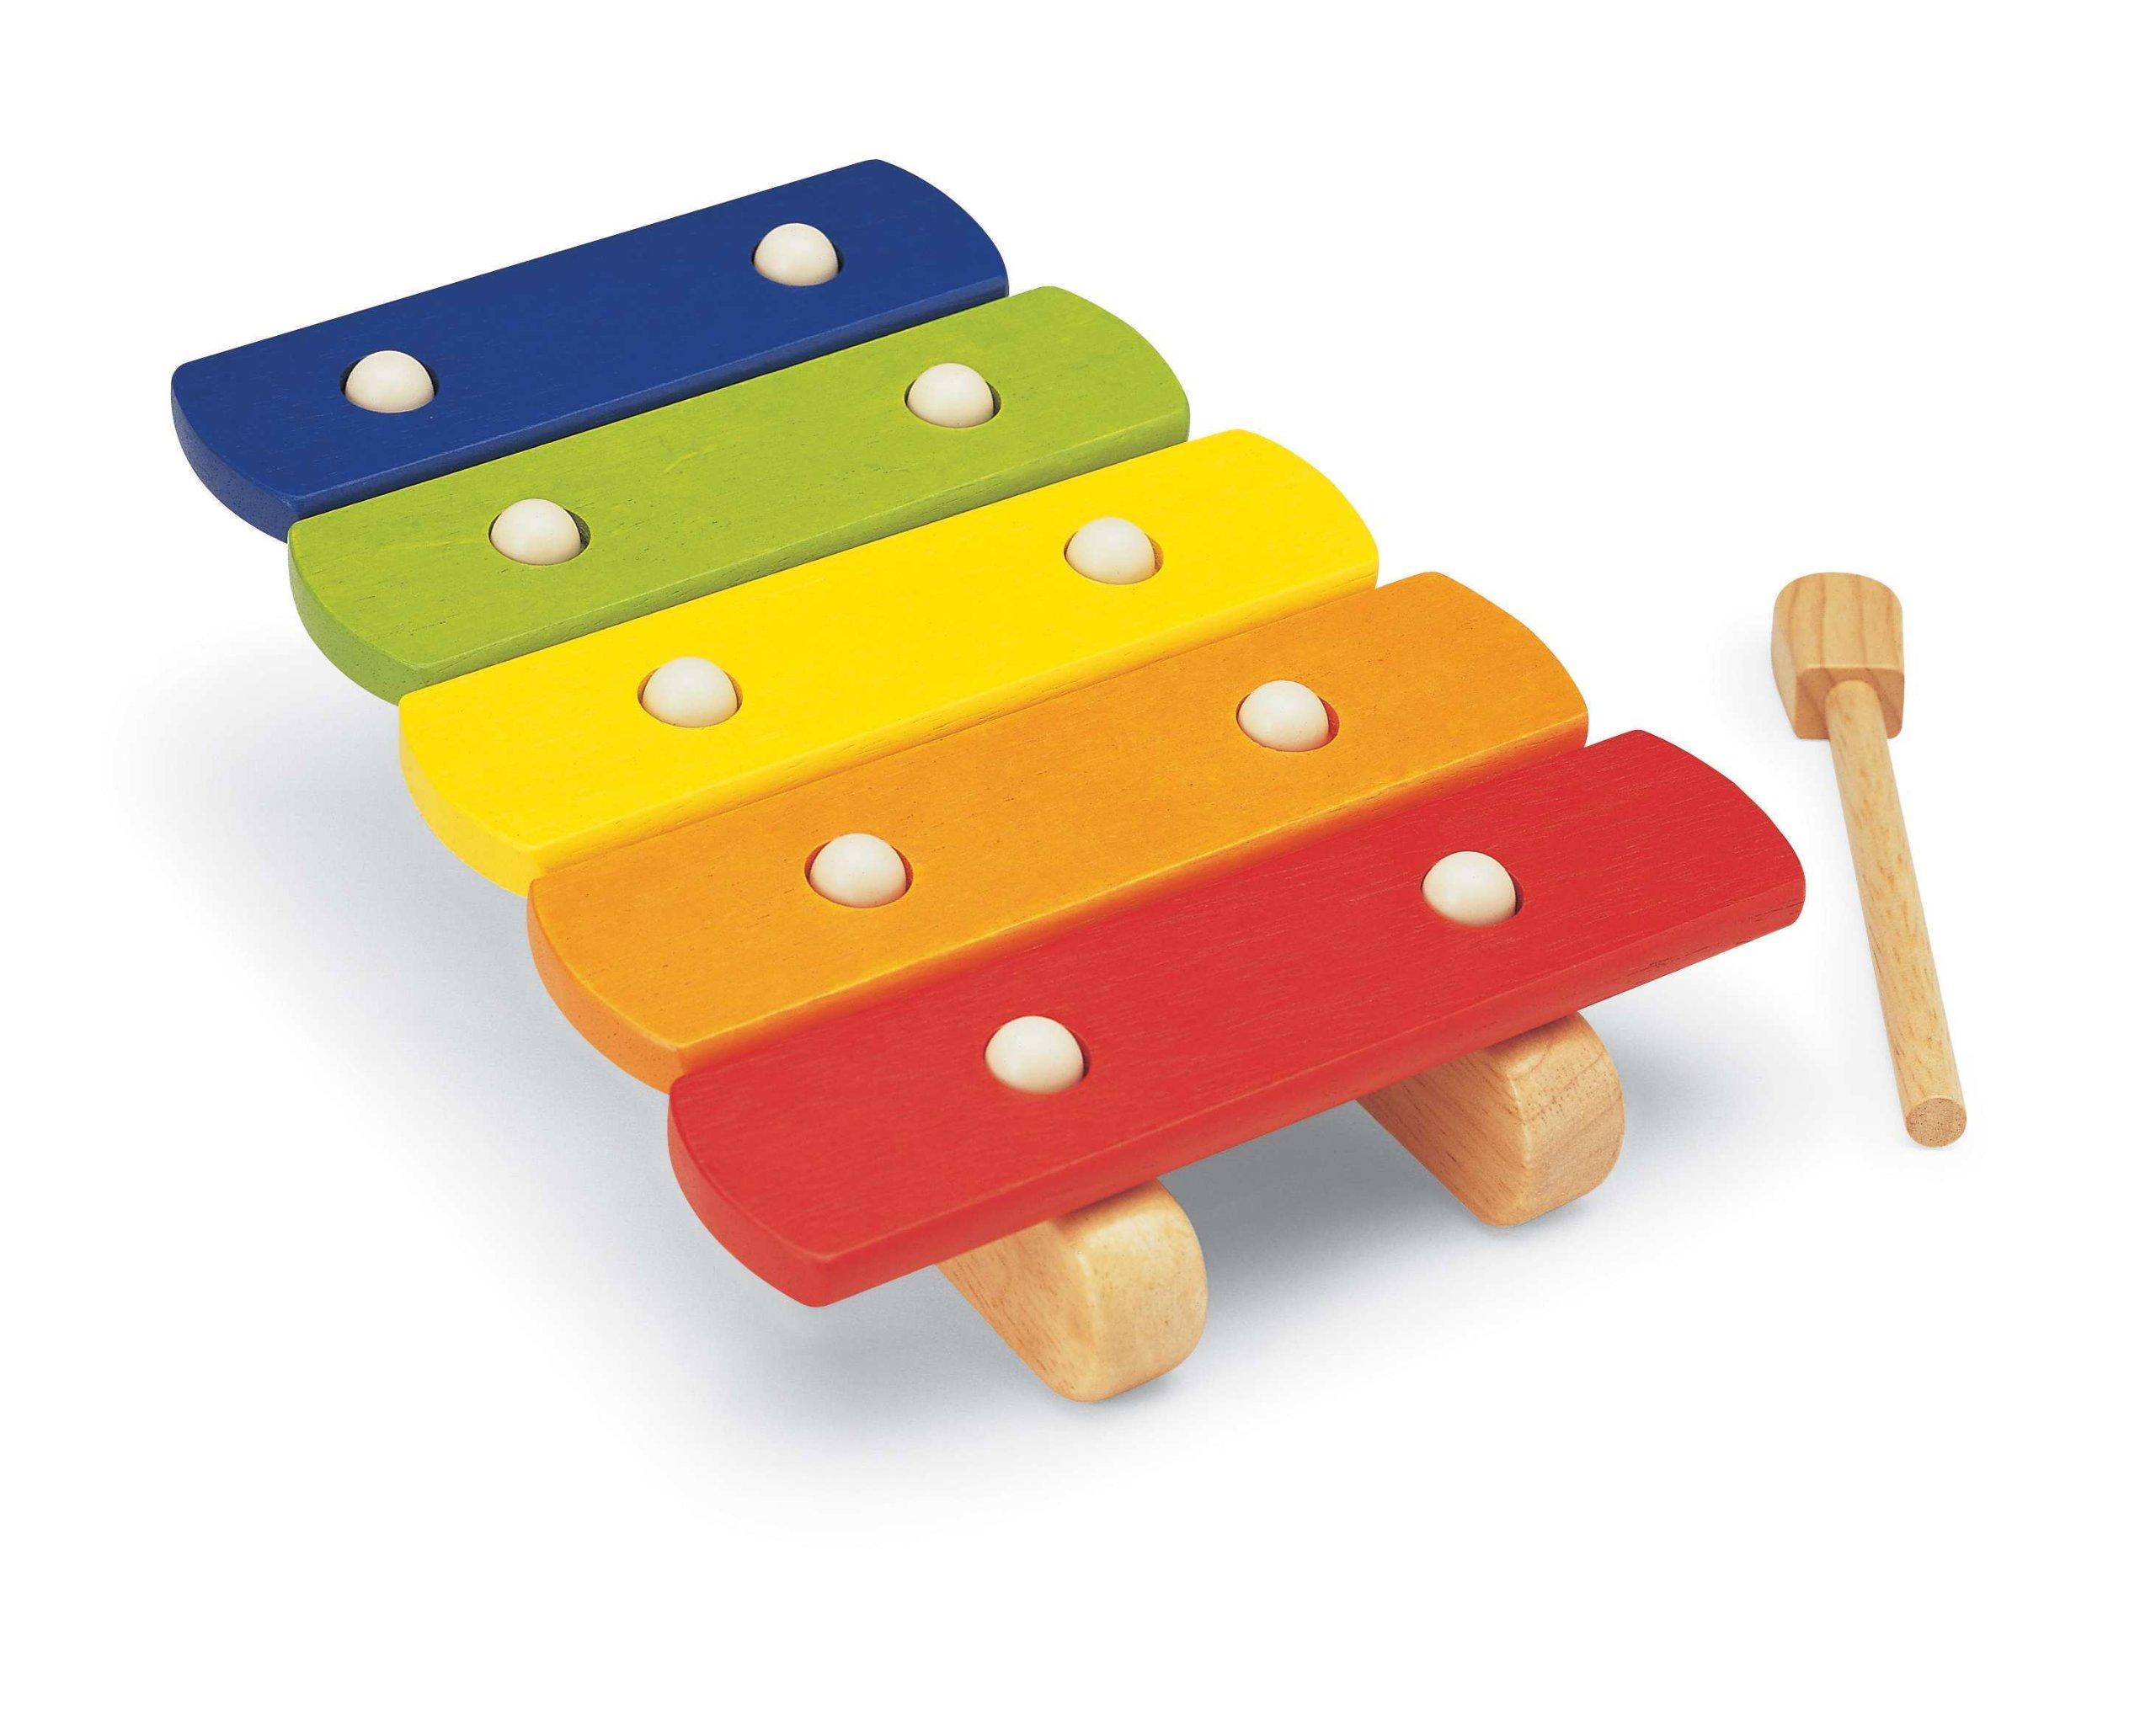 Pintoy Basic - Xilofono in legno